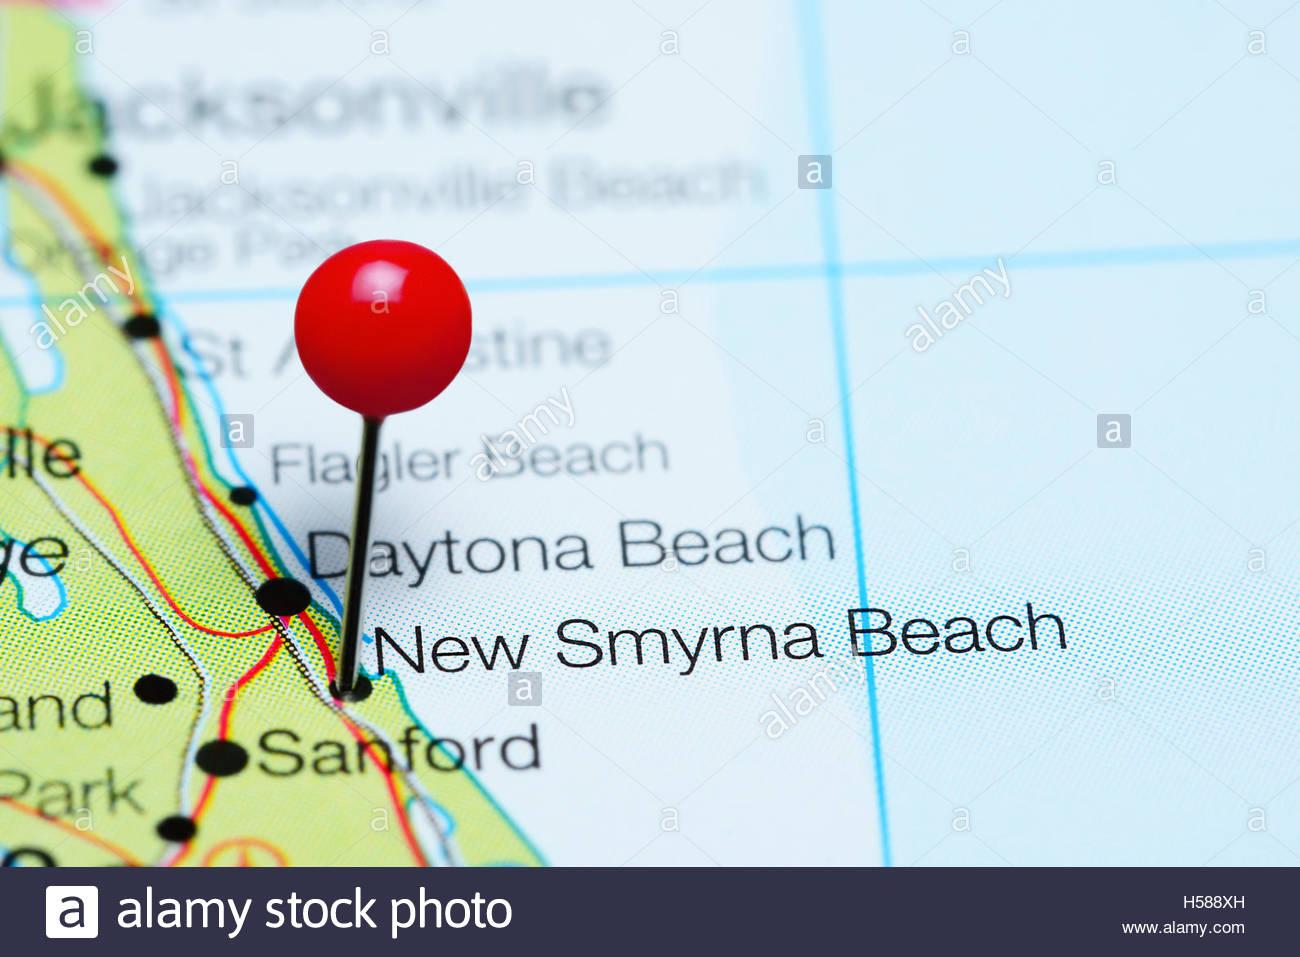 New Smyrna Beach Florida Stock Photos & New Smyrna Beach Florida - New Smyrna Beach Florida Map